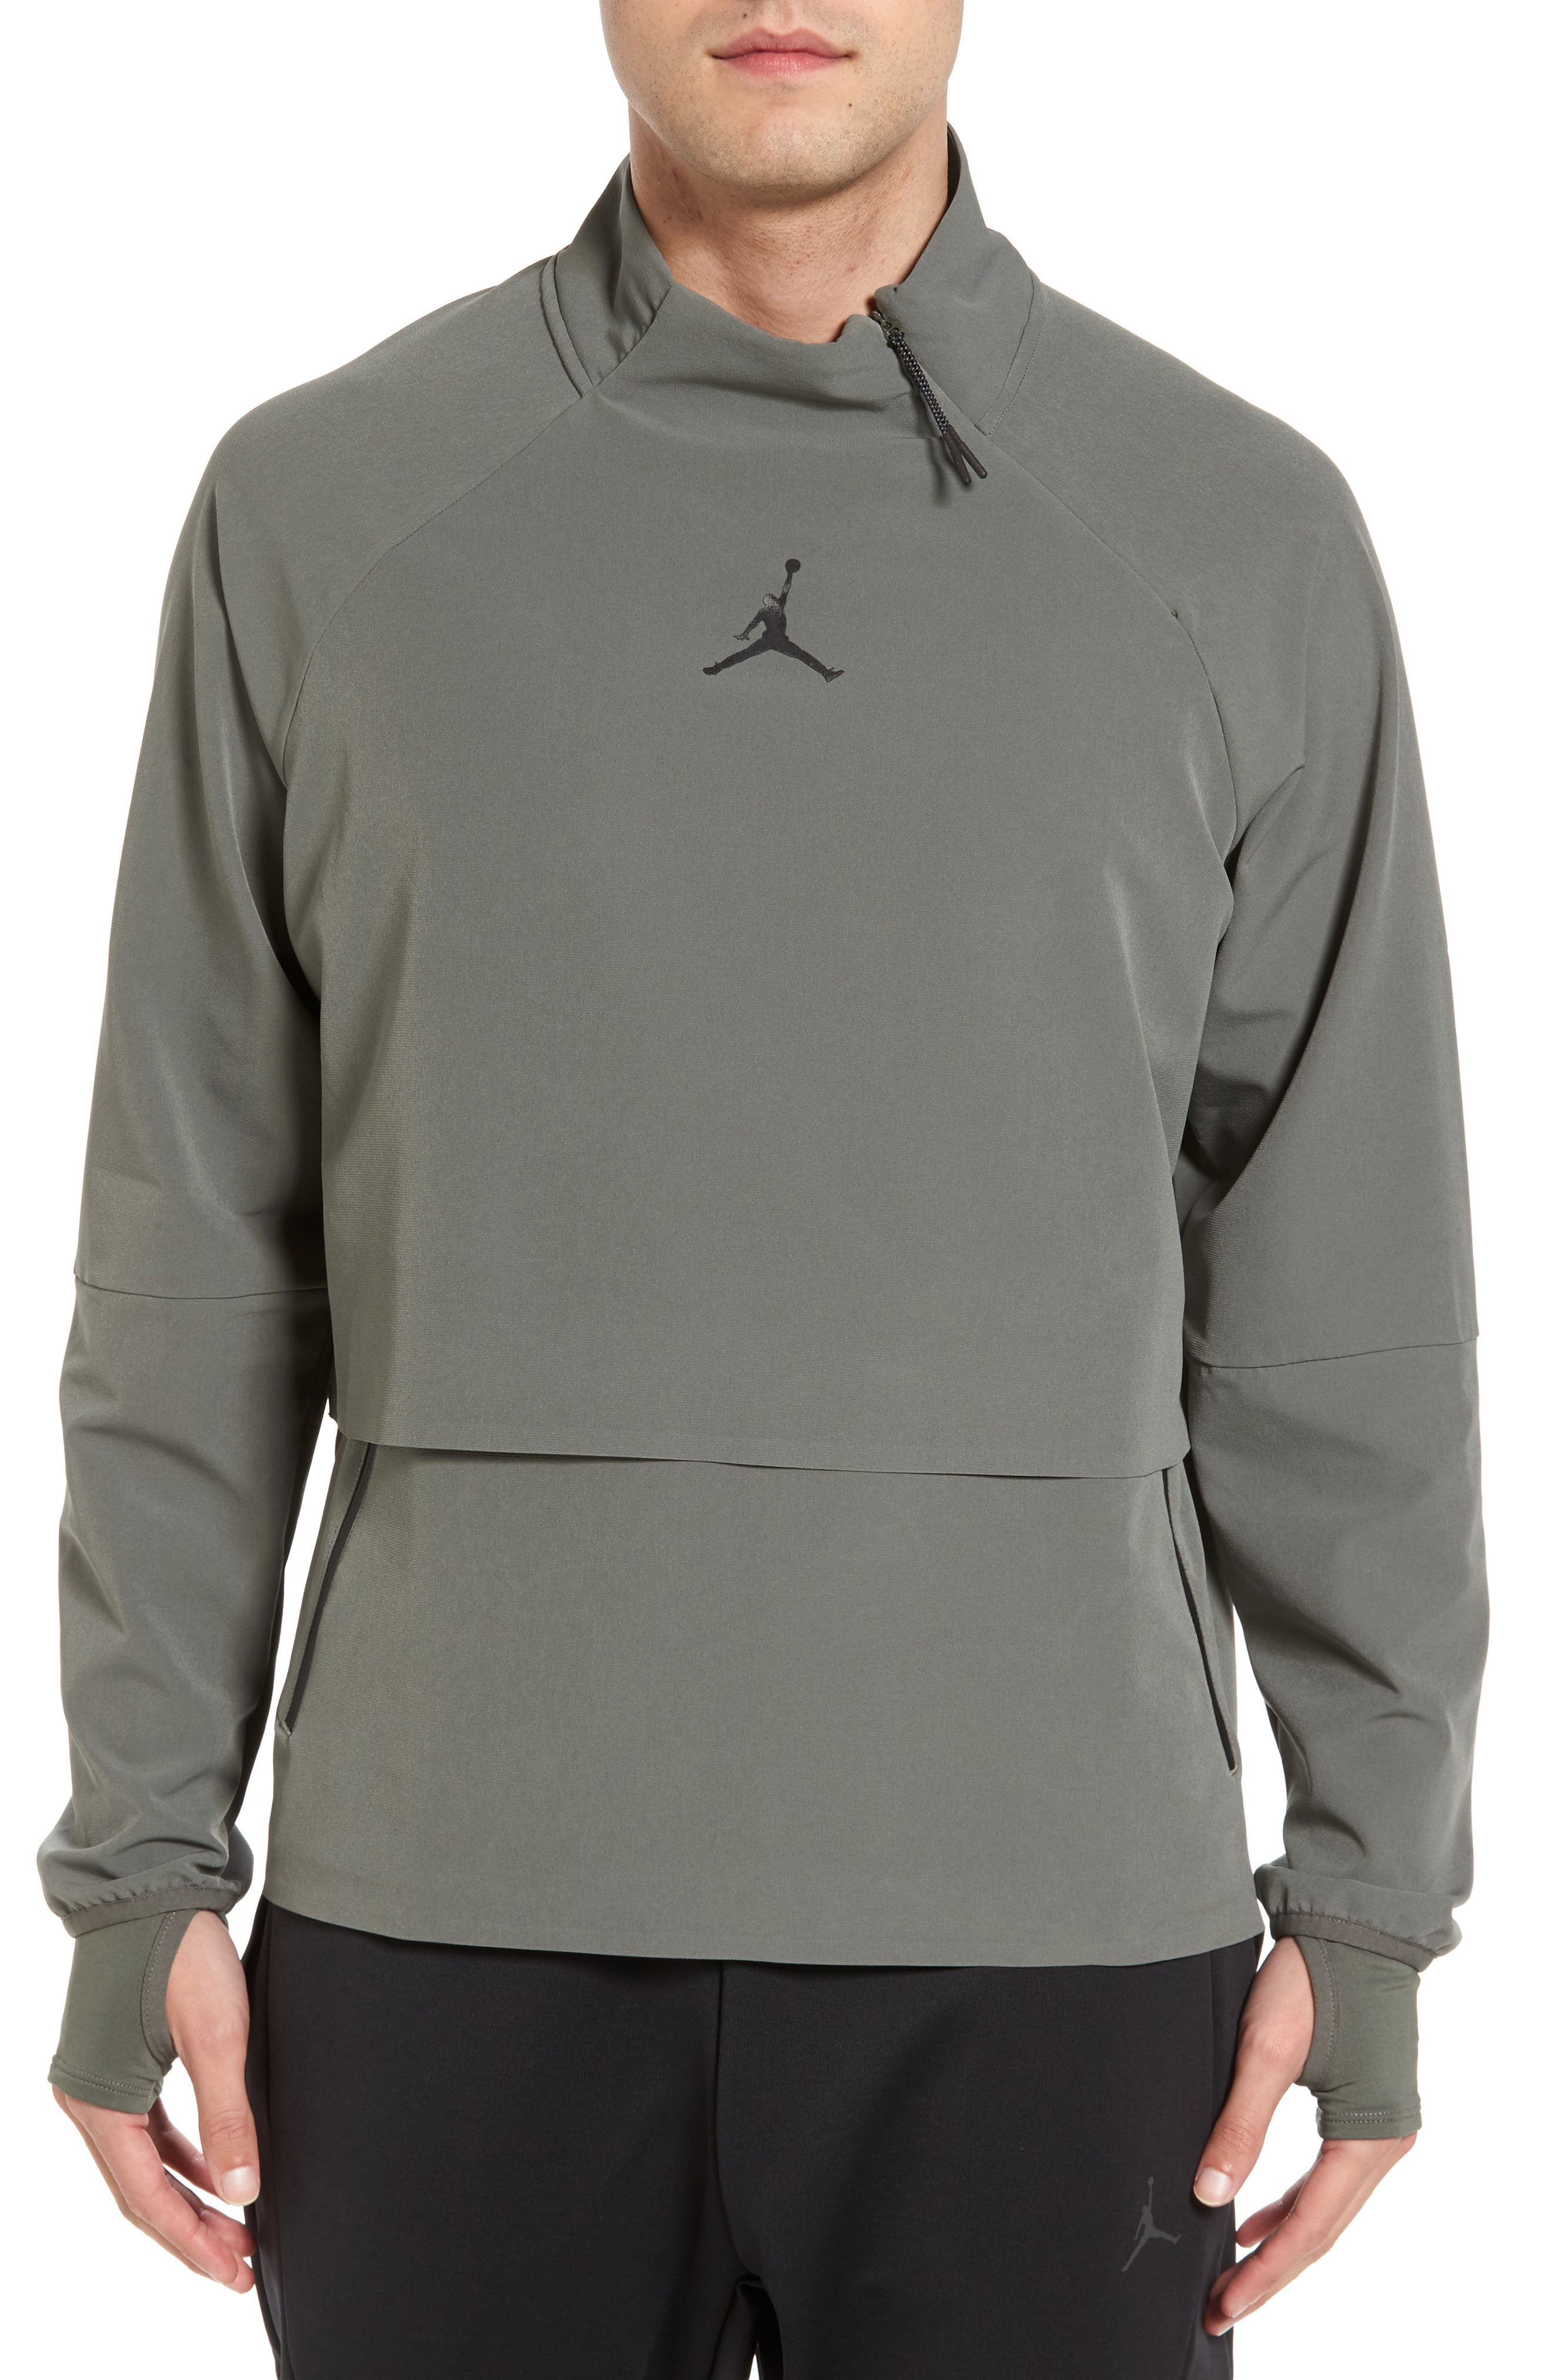 23 Tech Shield Jacket,                         Main,                         color, River Rock/ Black